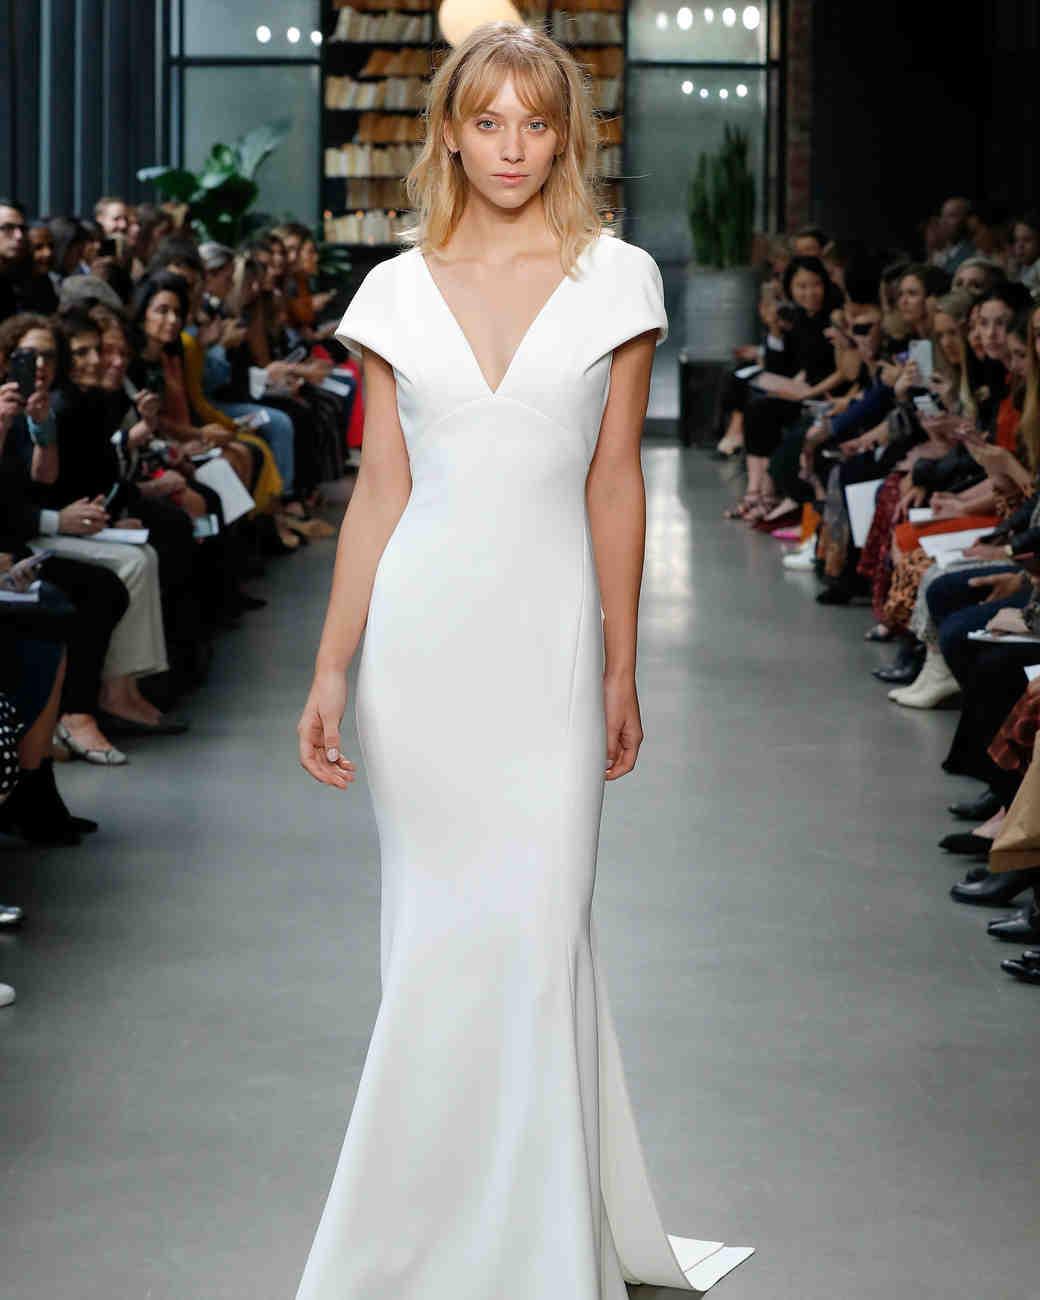 Amsale Fall 2019 Sheath Vneck Wedding Dress: Deep Scoop Neck Wedding Dress At Reisefeber.org